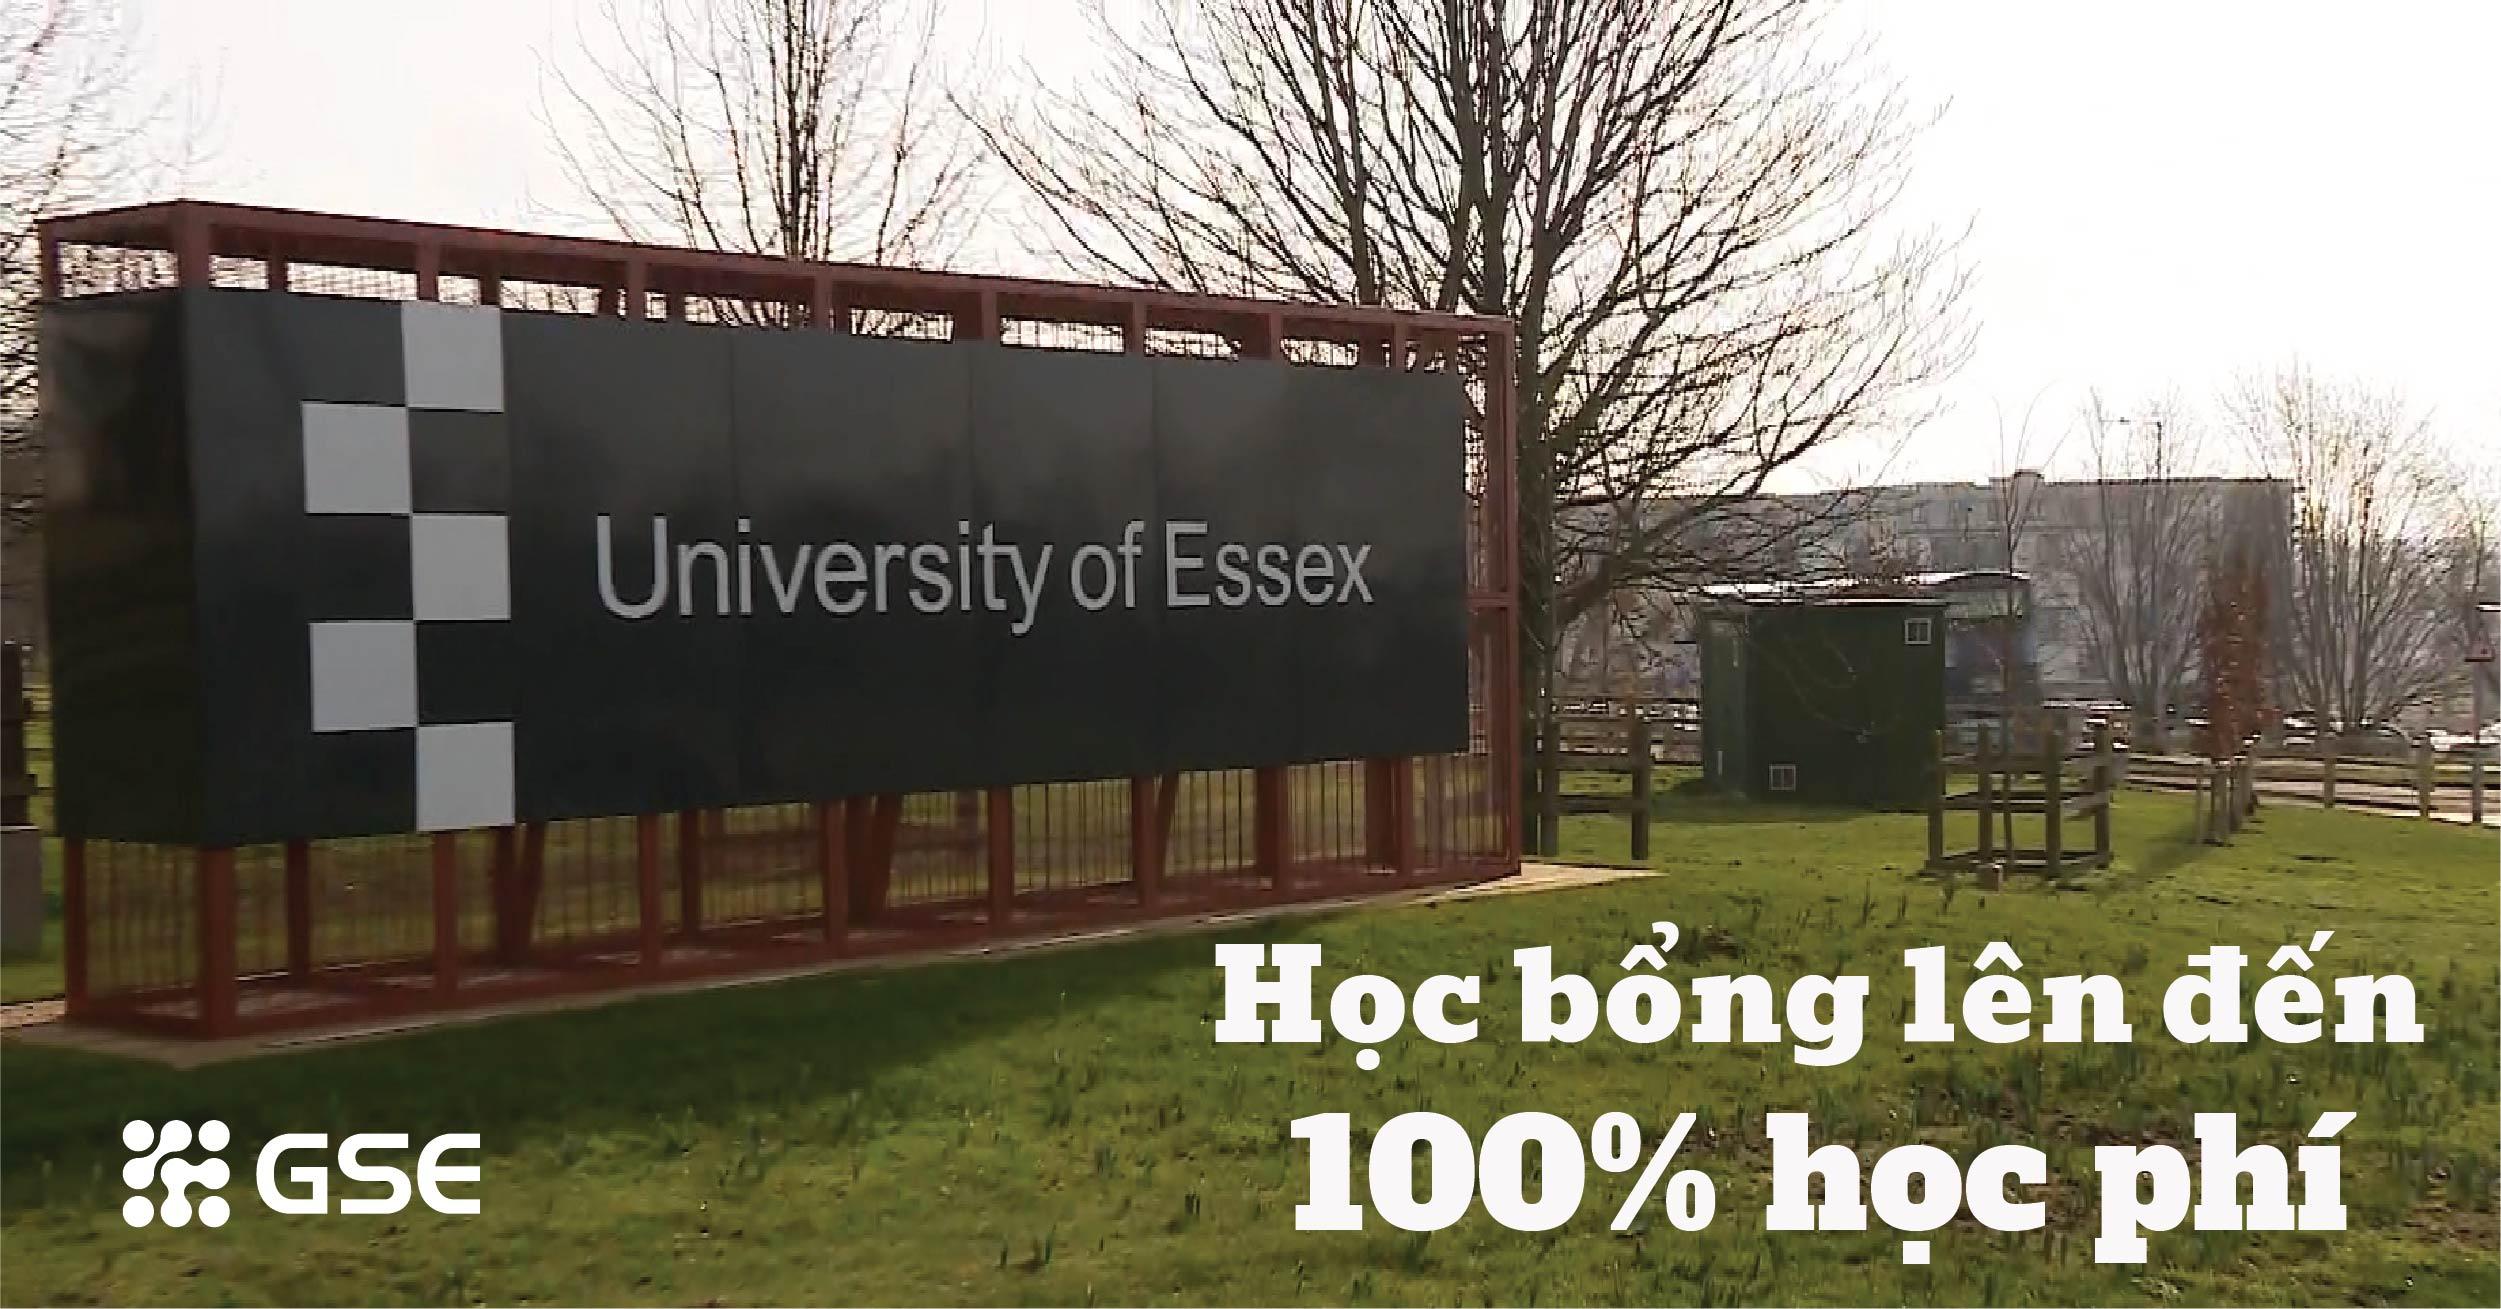 University Of Essex 03